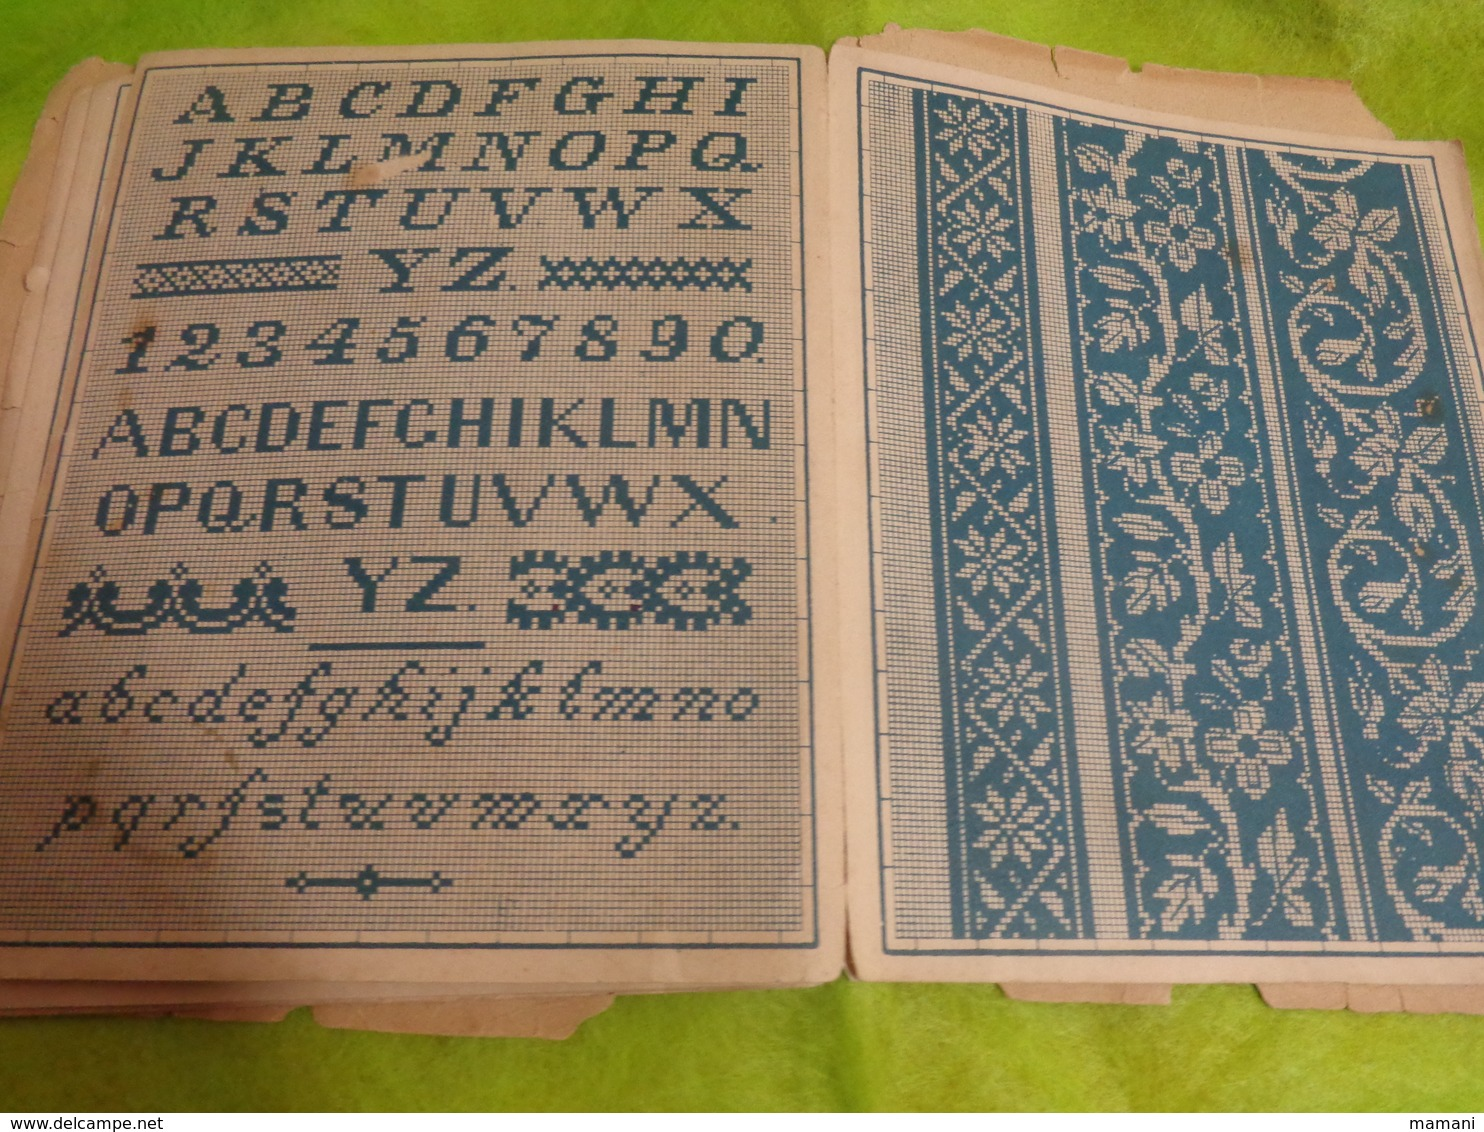 Album Dessins Alphabets+divers 10 Pages-22x16 Cm Environ-neuheiten In Stick Album Novelty Embroidery Patterns Type Sajou - Loisirs Créatifs